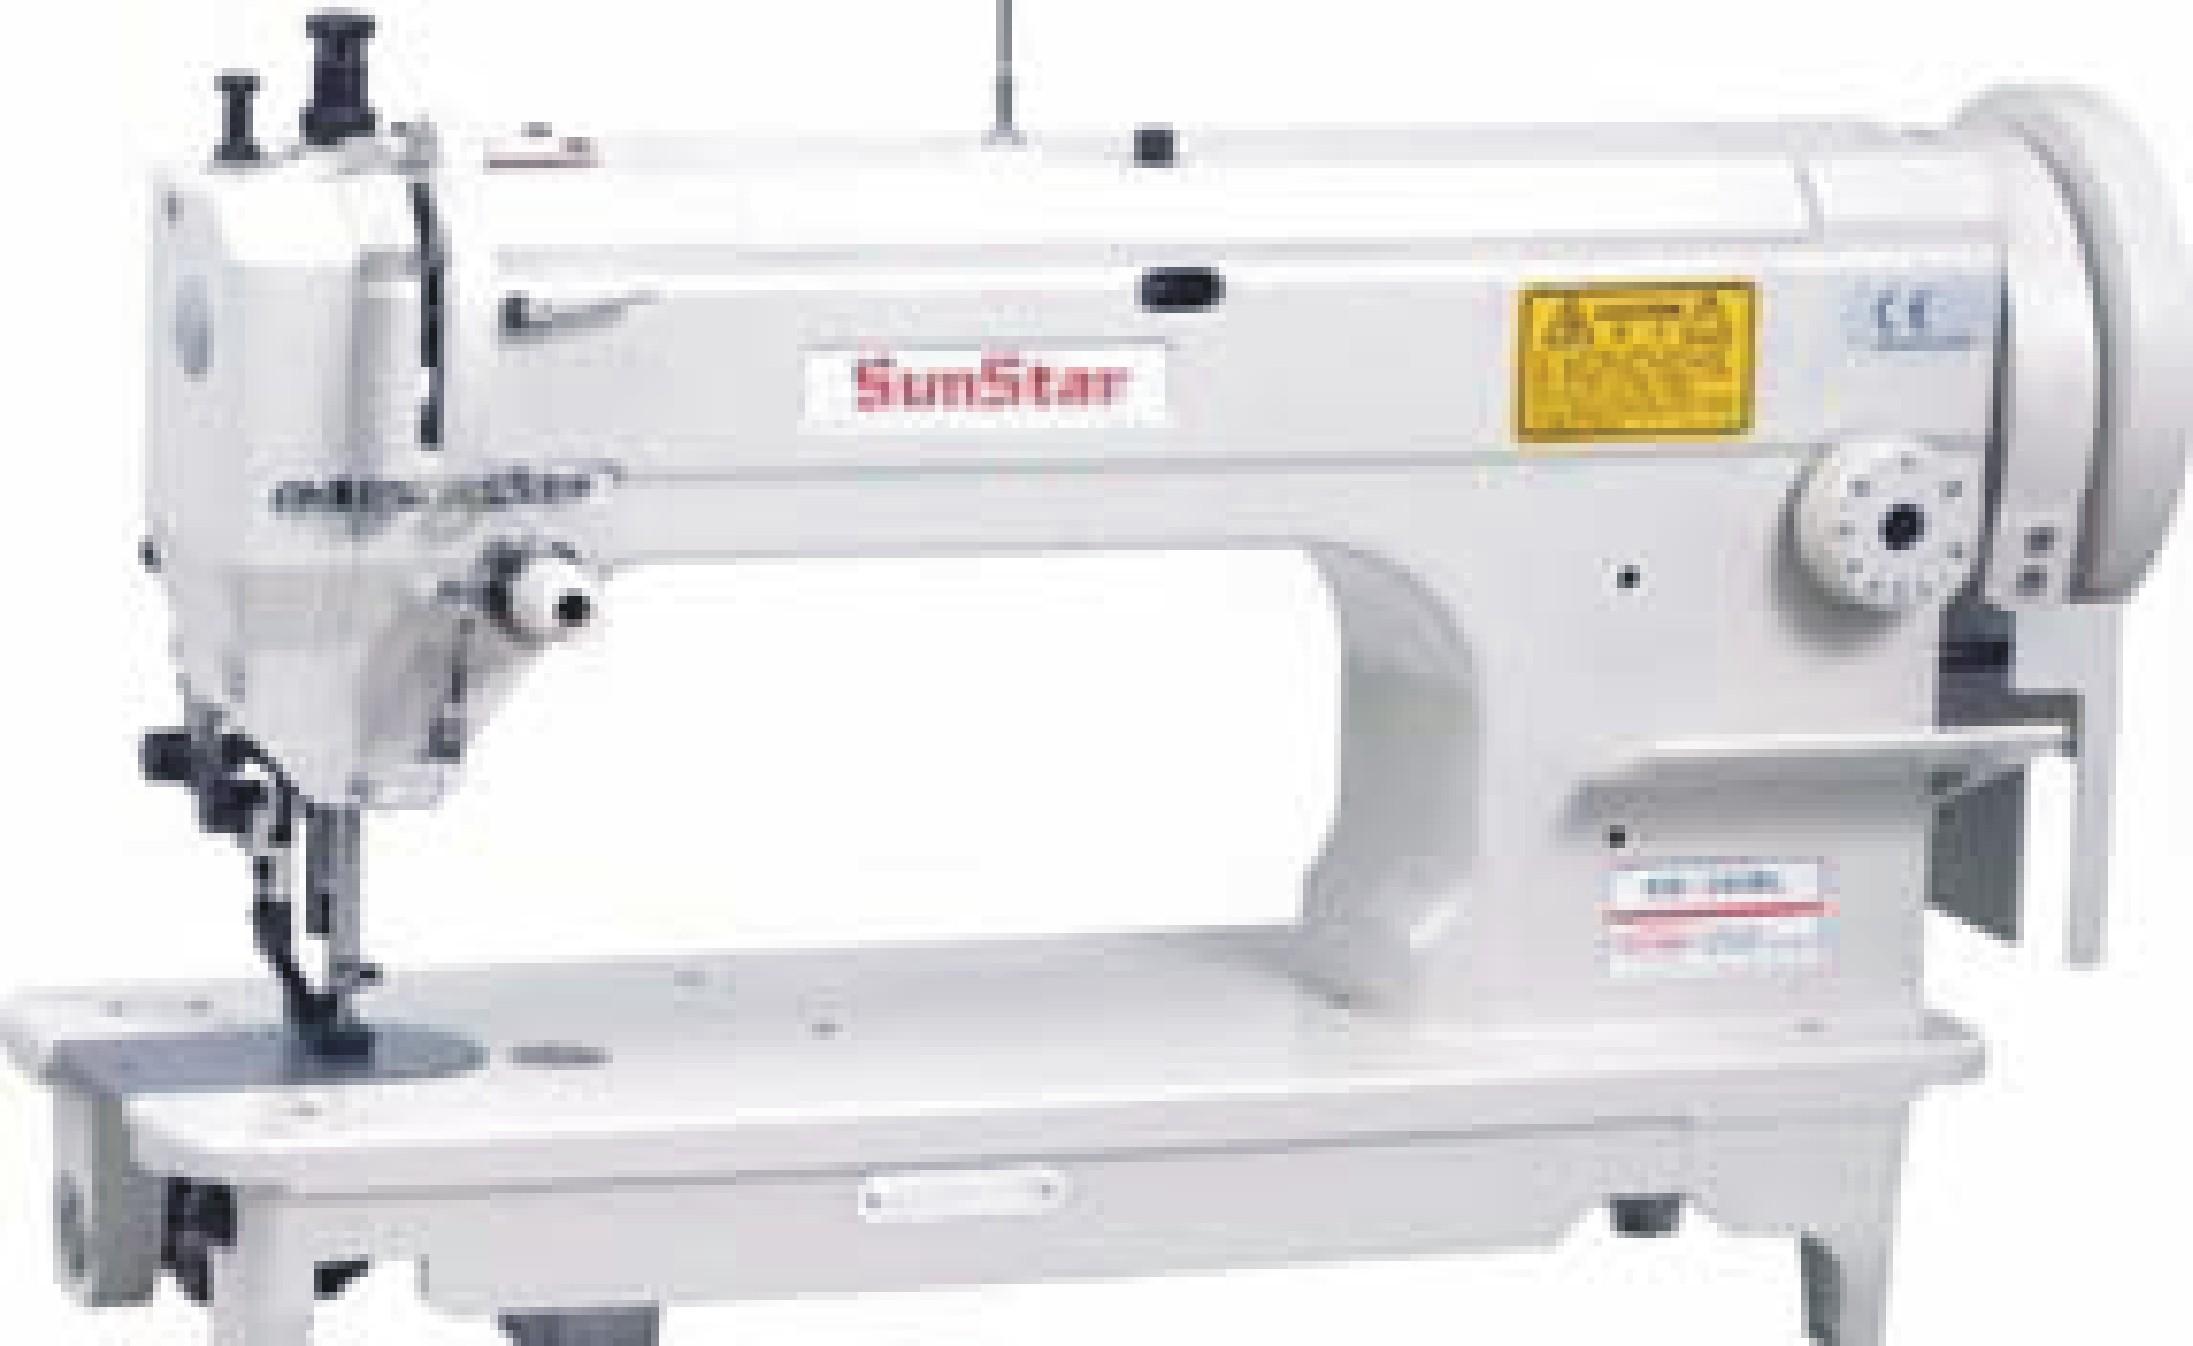 Maquina de coser buscar maquinas coser industriales for Maquinas de coser zaragoza